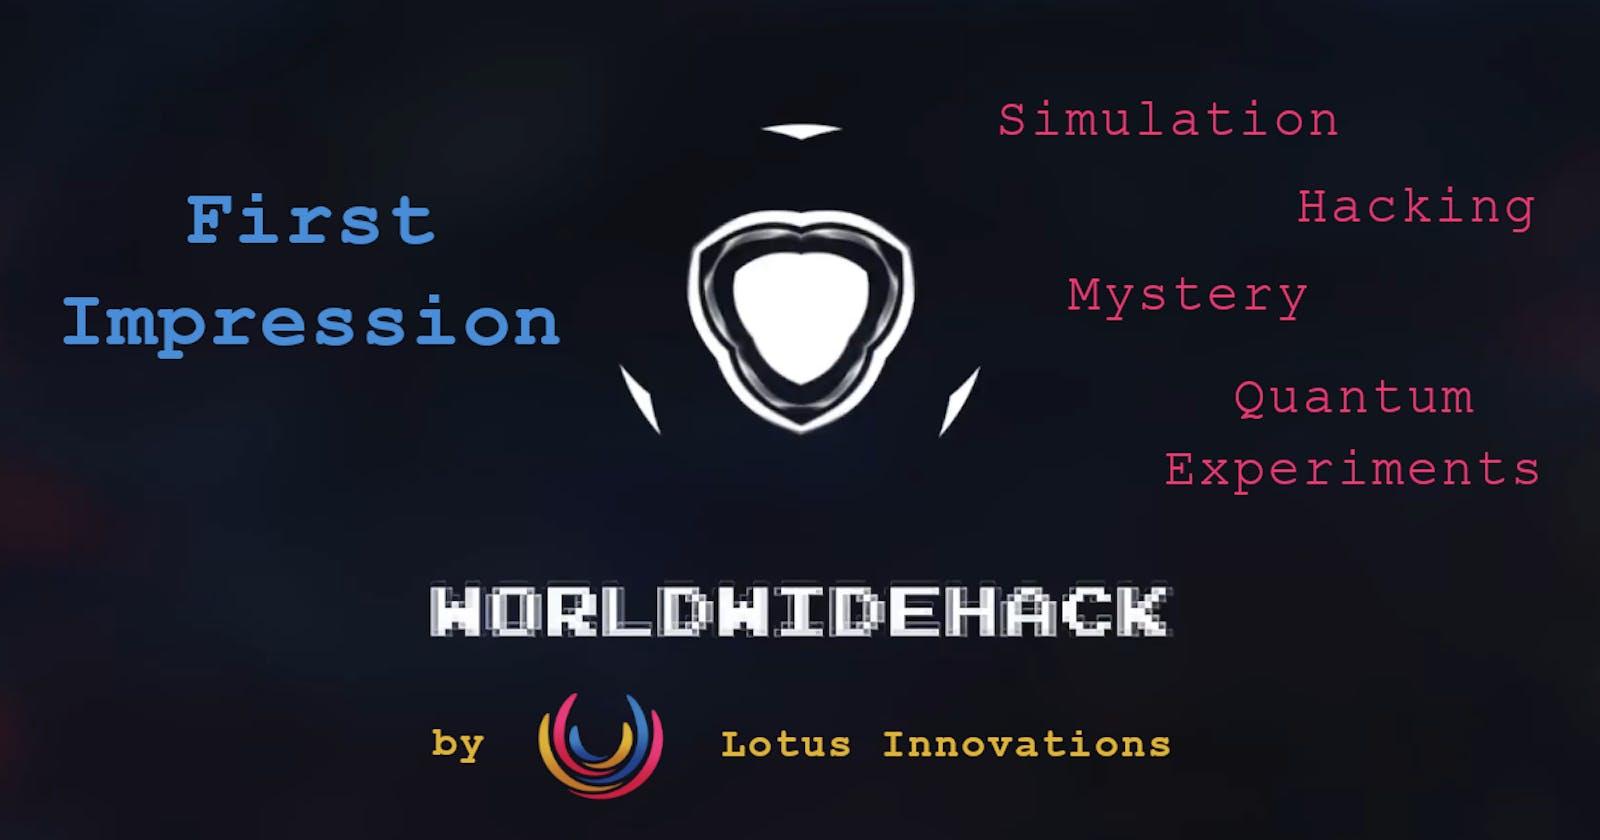 World Wide Hack - Alpha First Impression